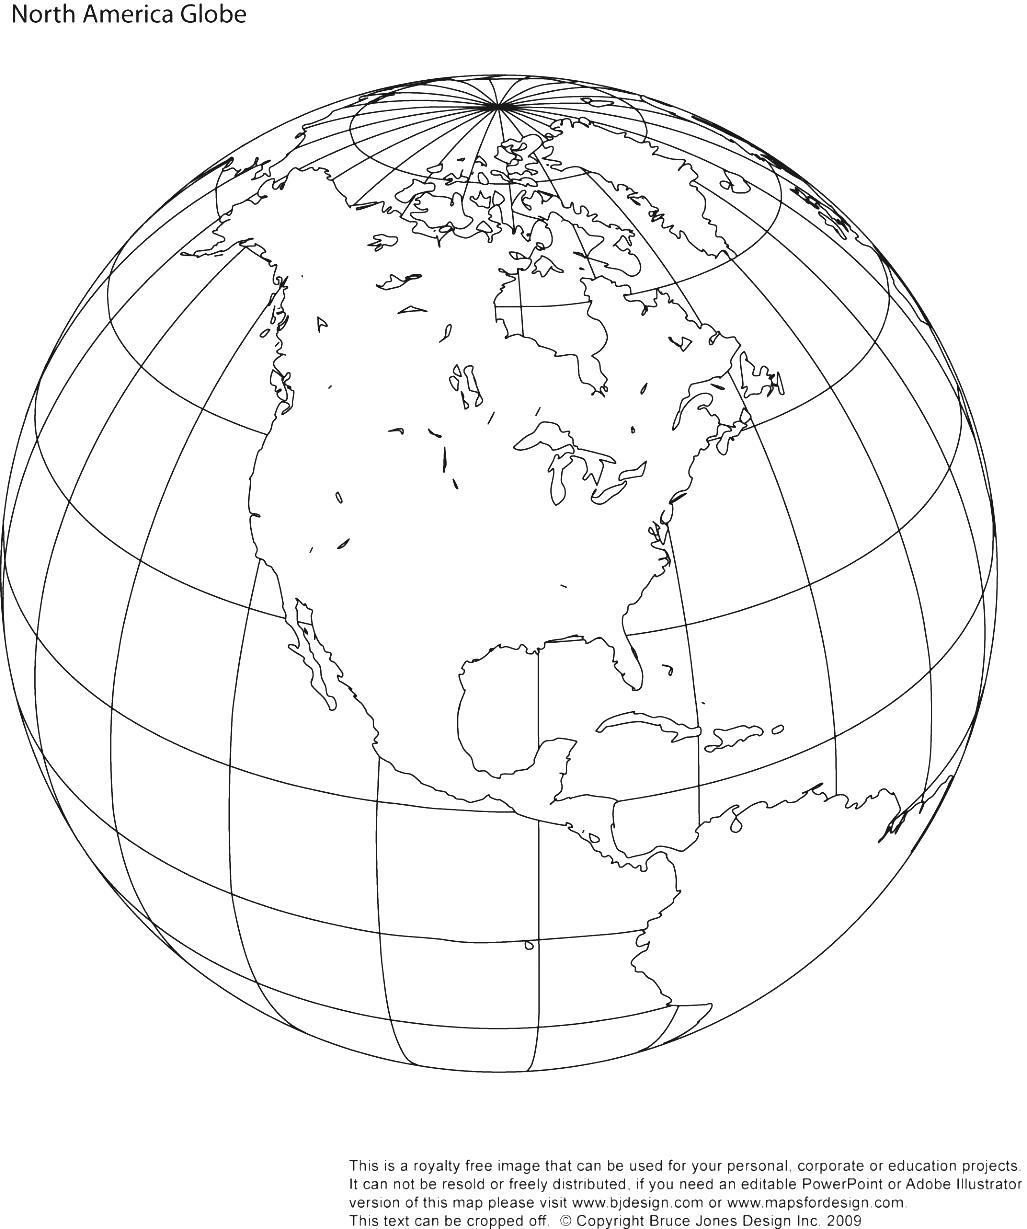 Drawn globe Outline Usa Mexico Map Central